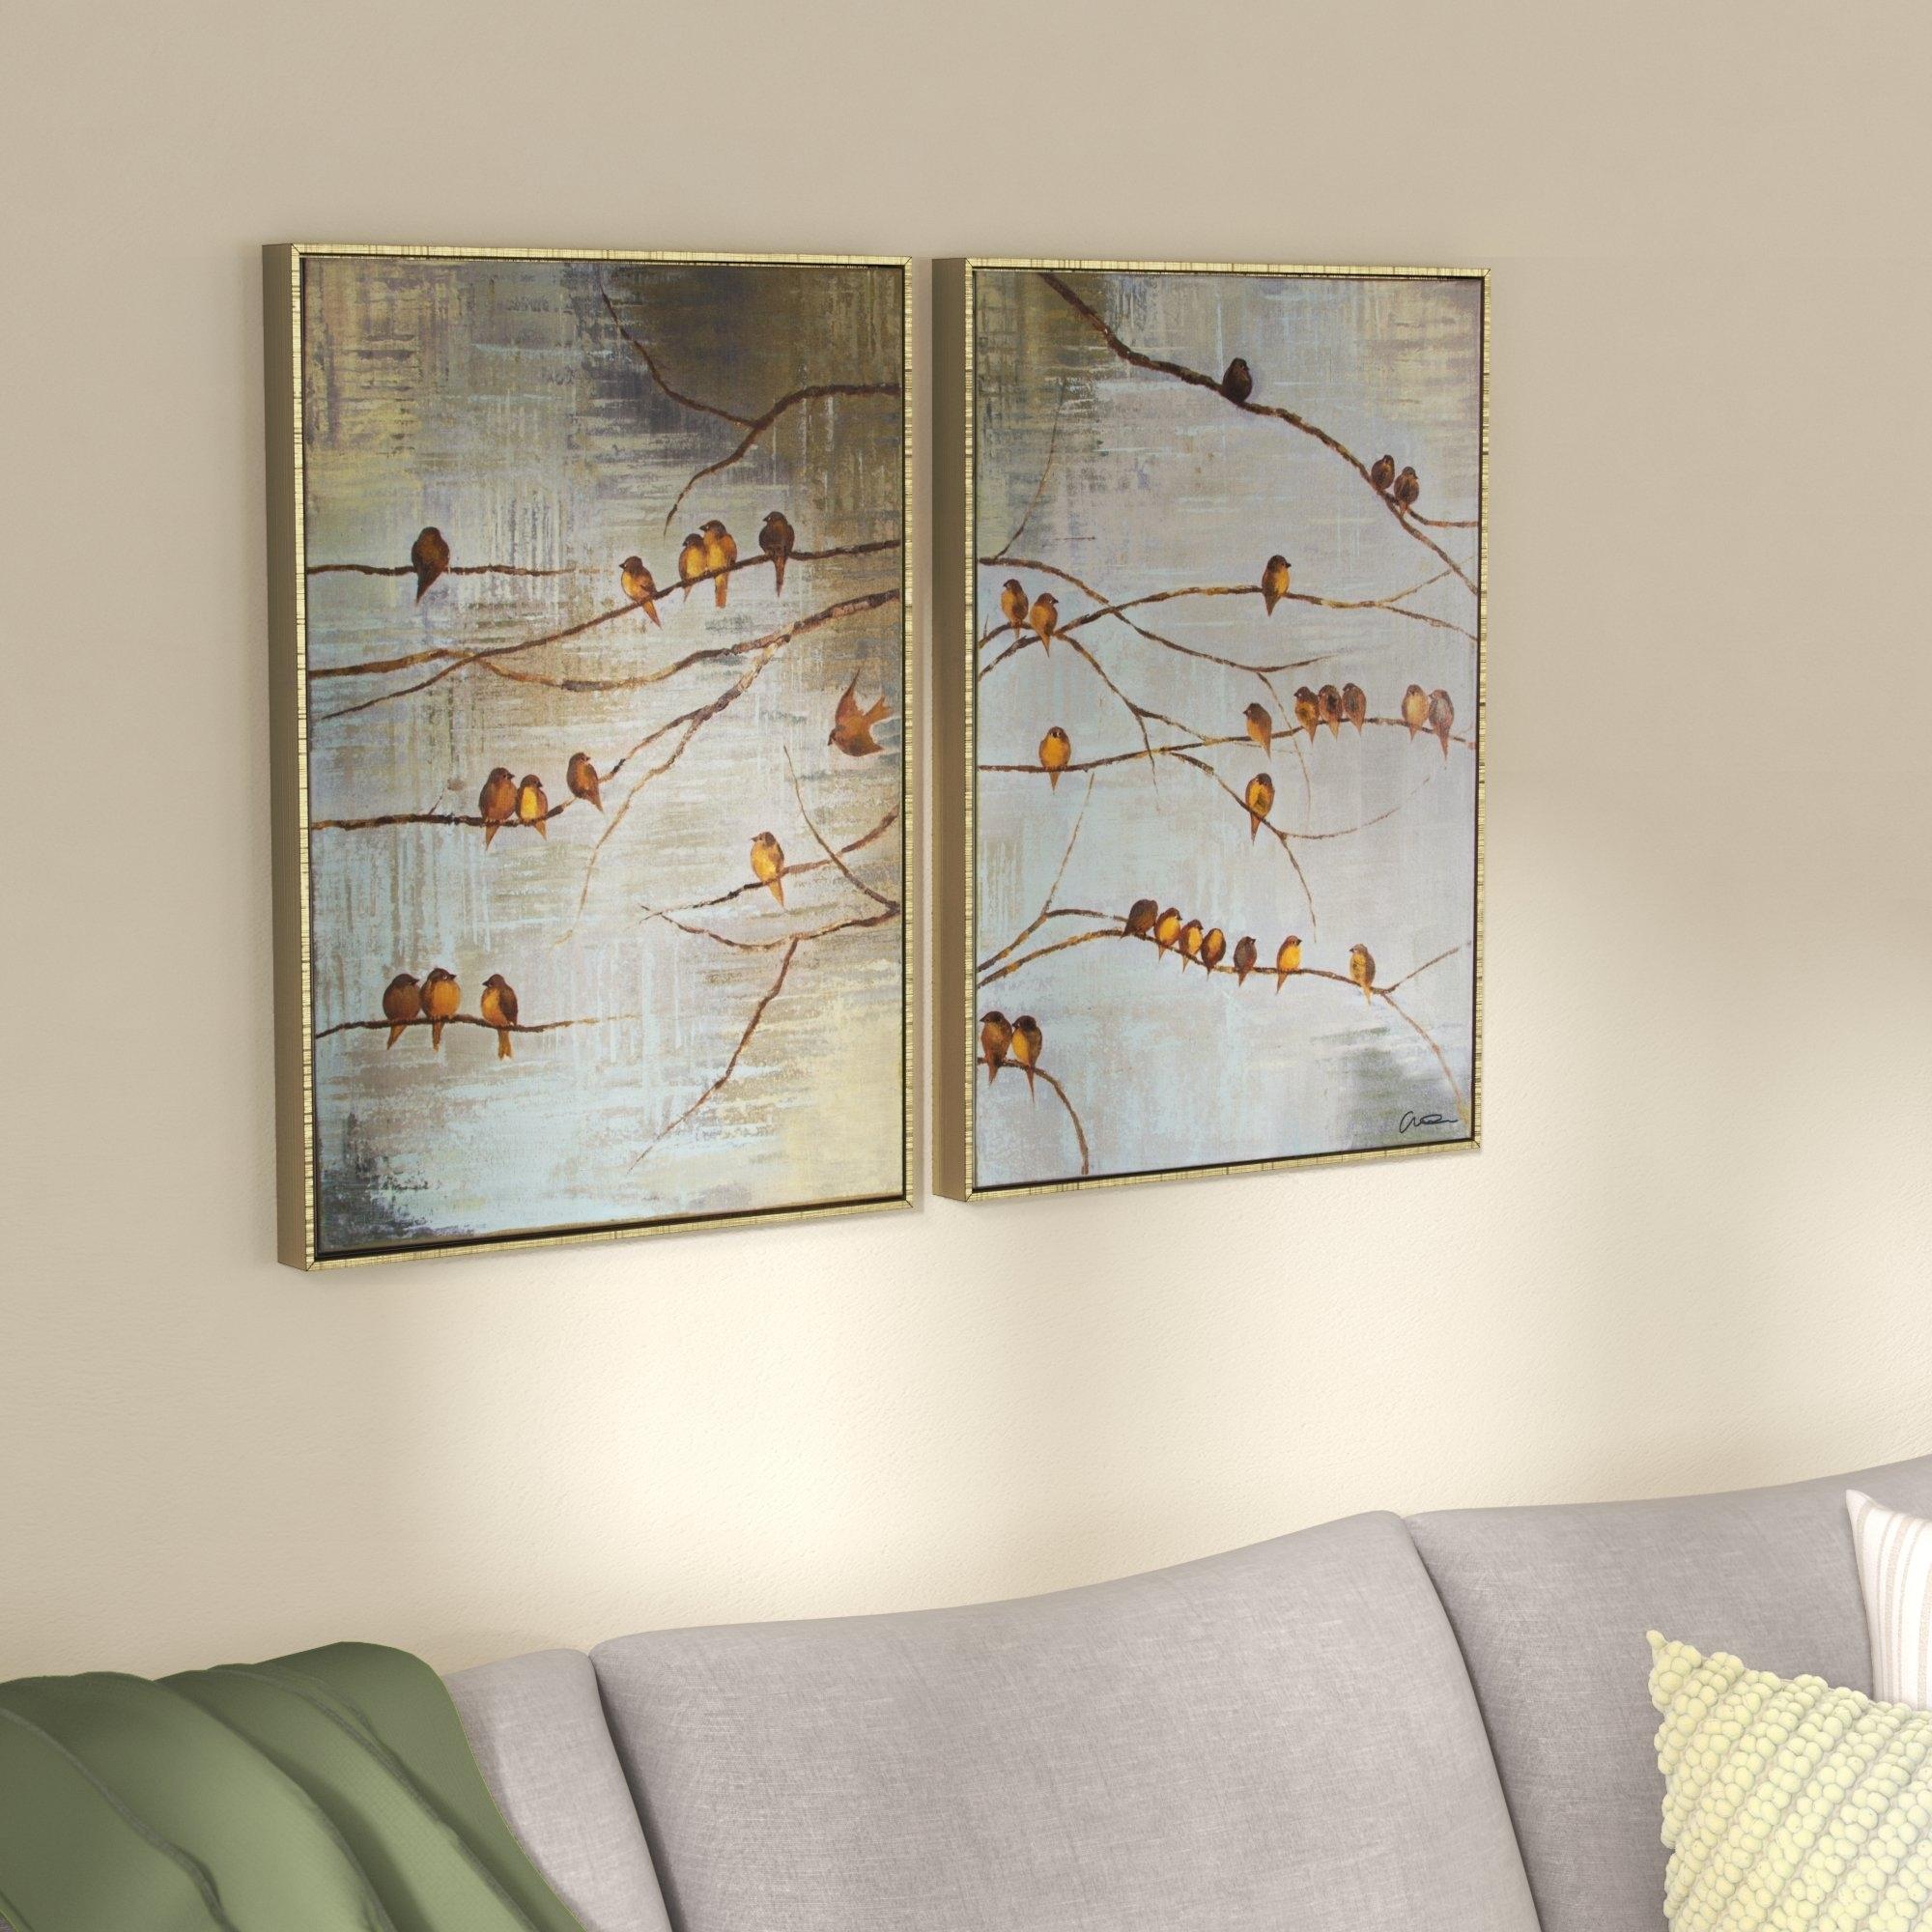 Alcott Hill 'flock Of Birds Handpainted' Framed Graphic Art Print On pertaining to Bird Framed Canvas Wall Art (Image 6 of 20)